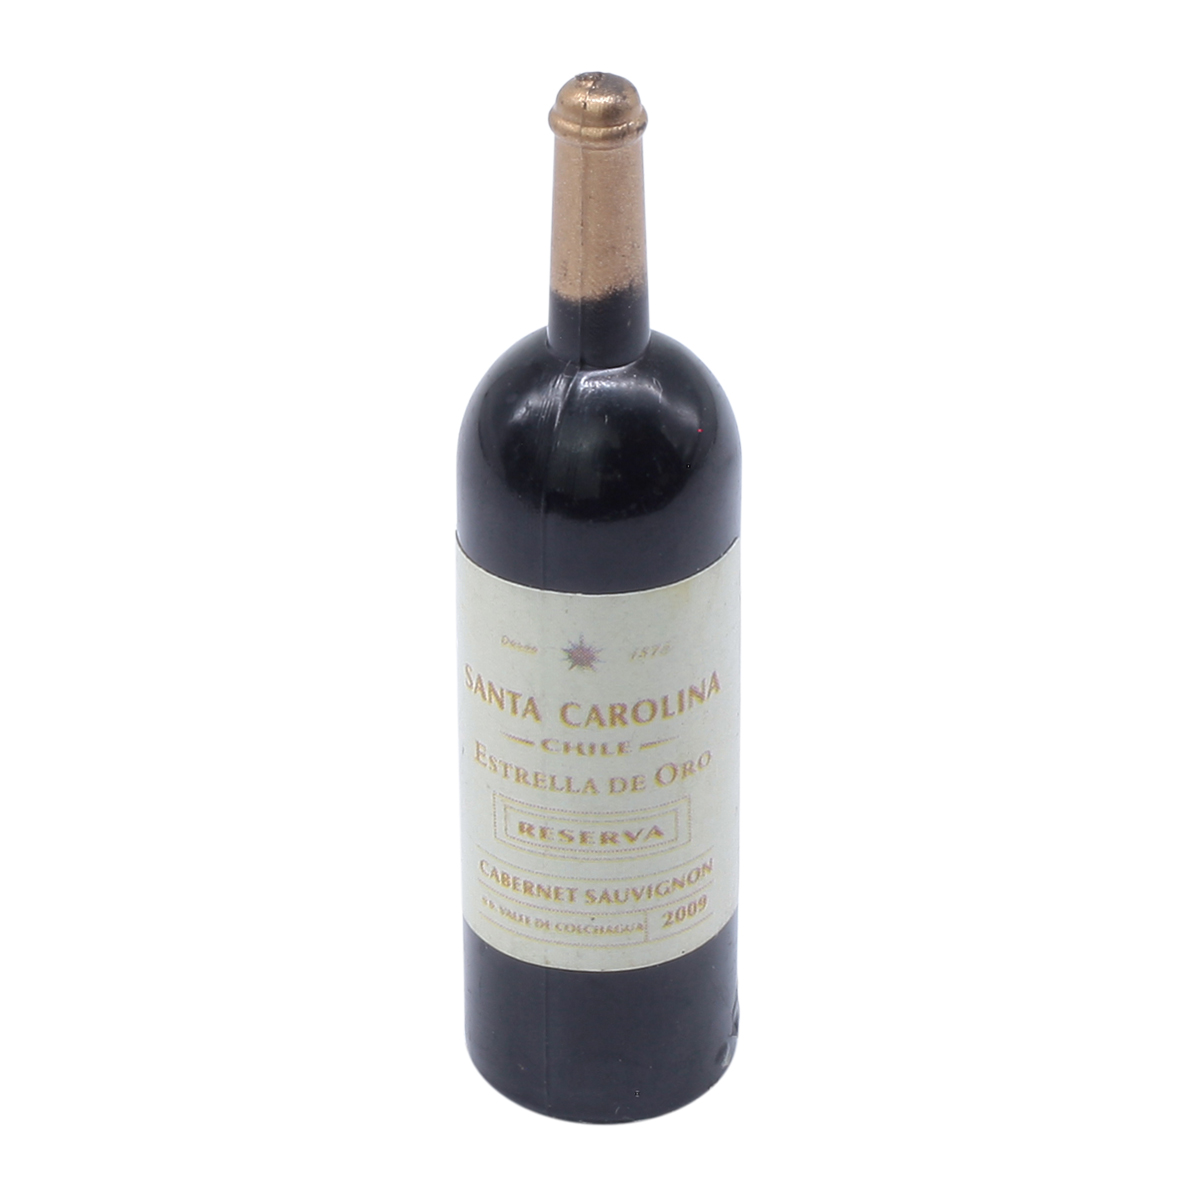 2AR201 Миниатюра. Бутылочка вина, 4,8см